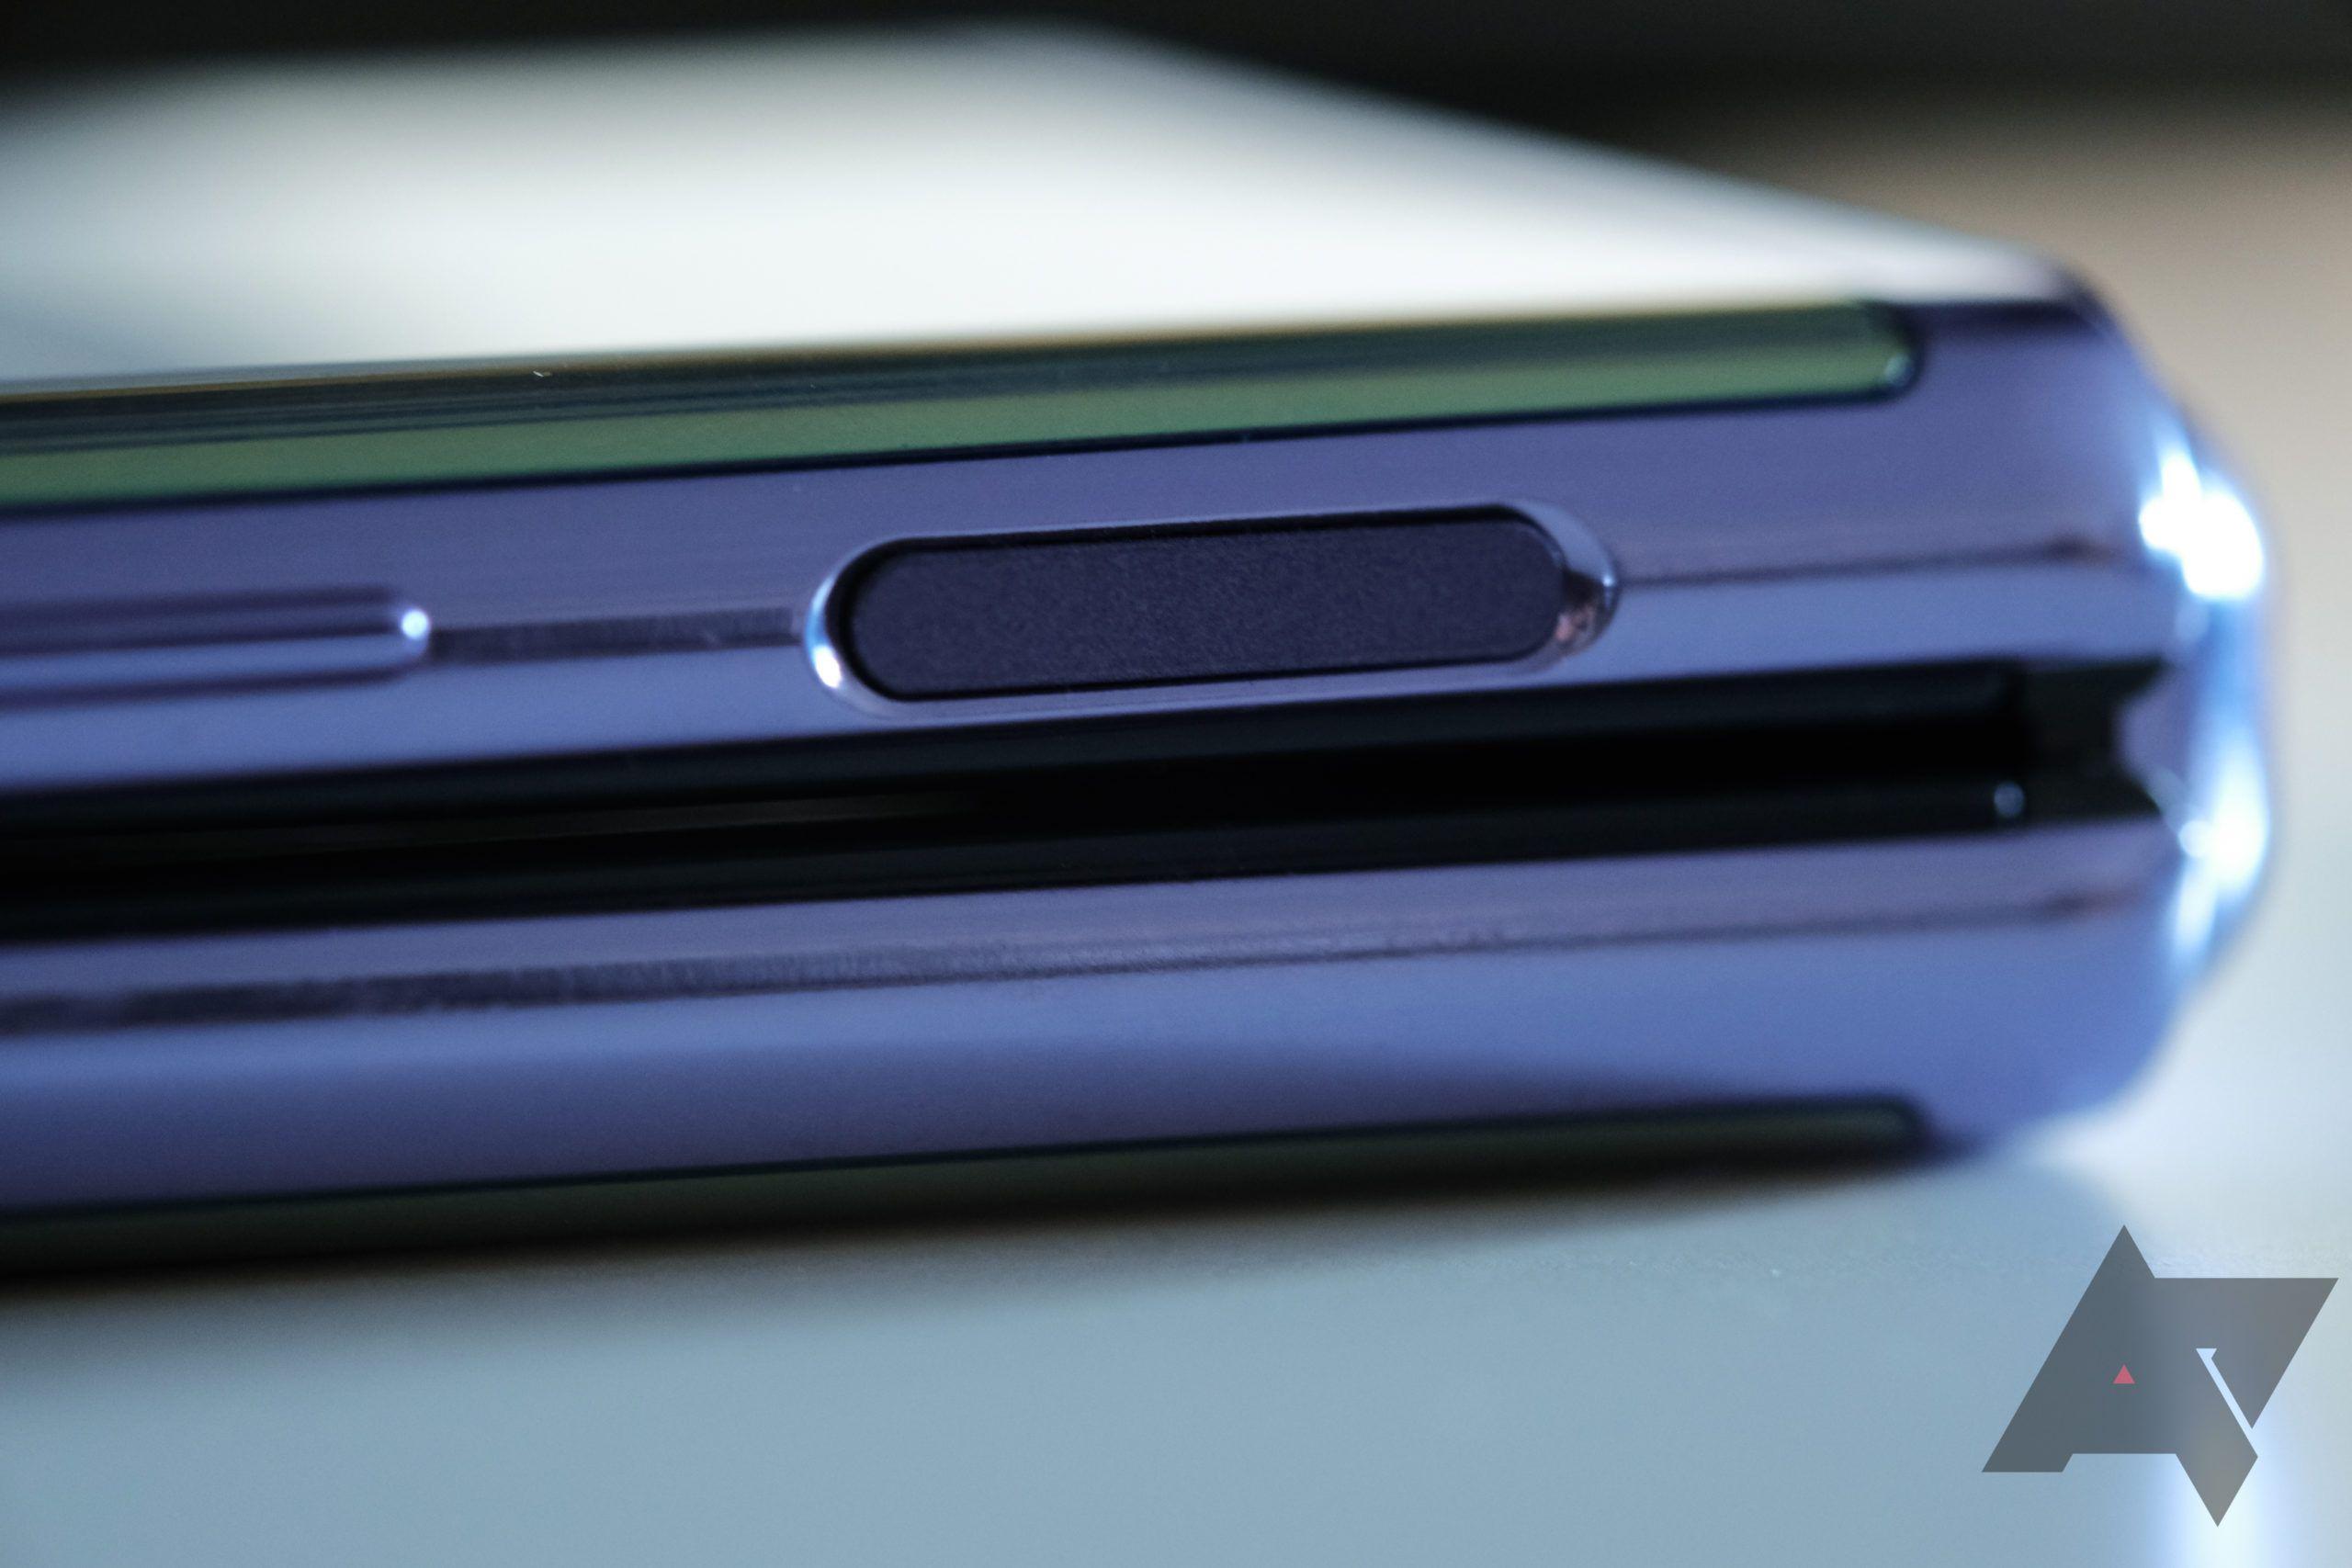 Galaxy Z Flip fingerprint sensor close-up.